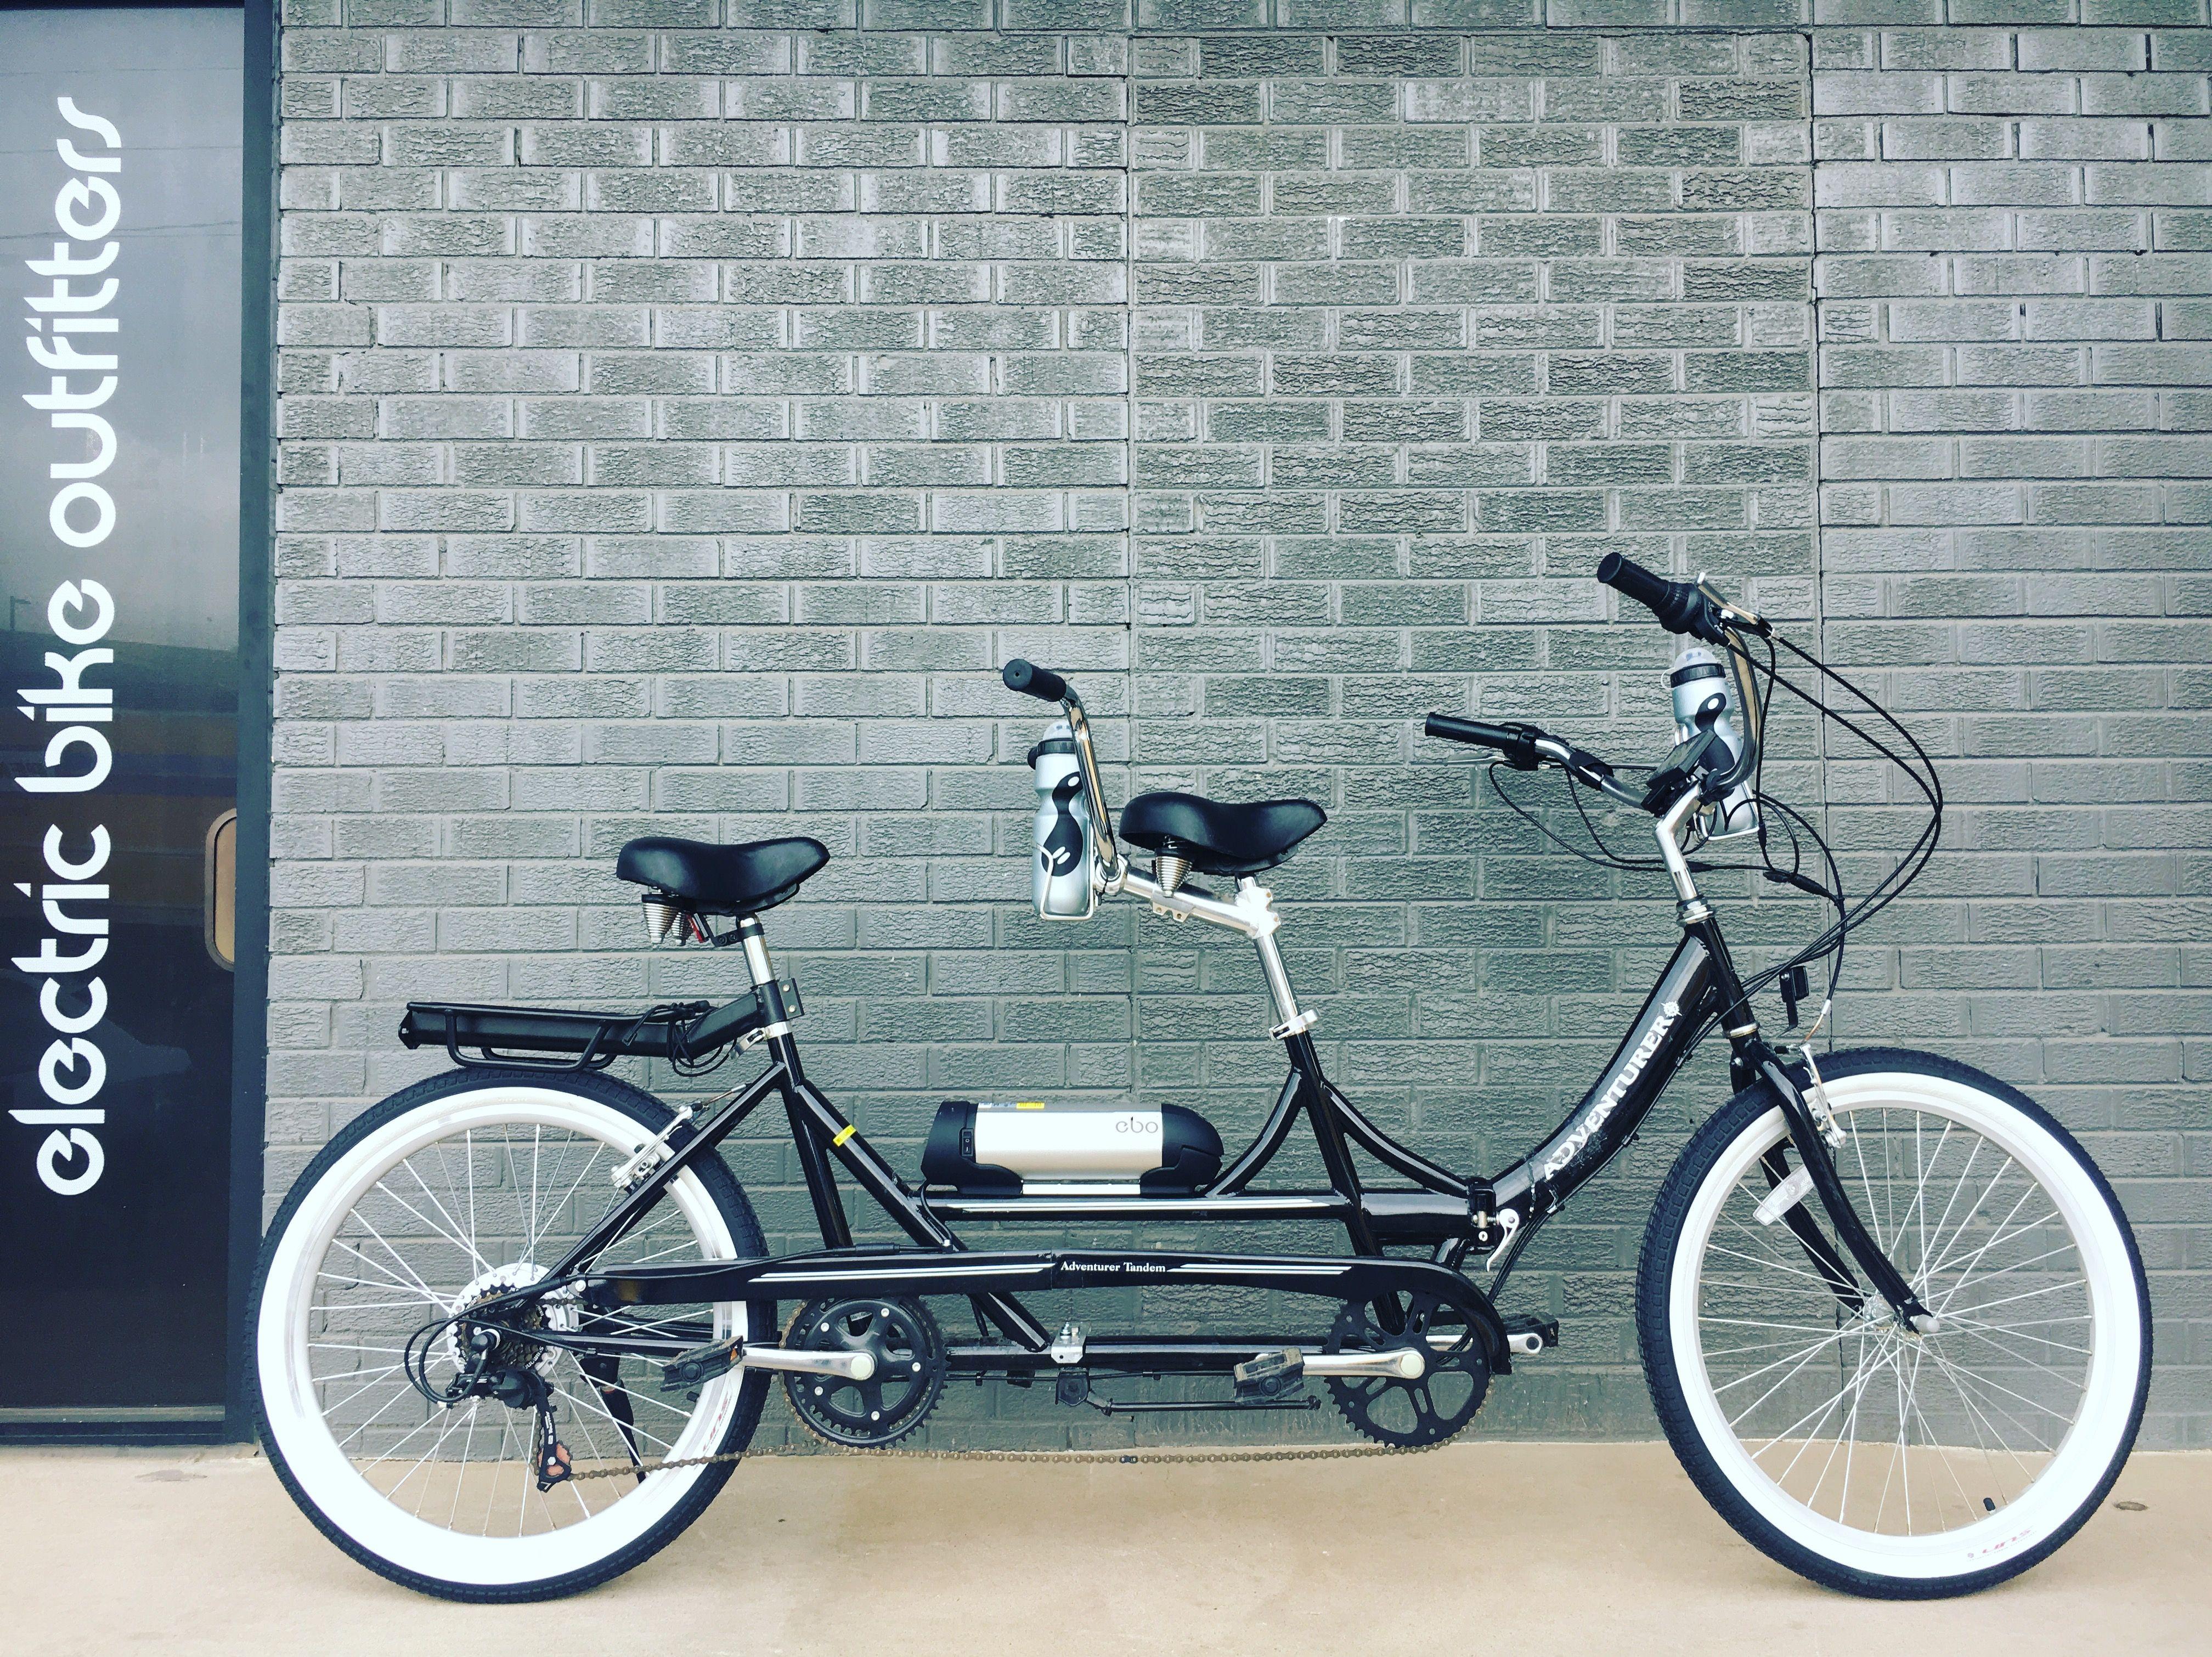 Ebo Phantom Electric Bike Kit Installed On A Adventurer Tandem Bike Electric Bike Kits Tandem Bike Bike Kit